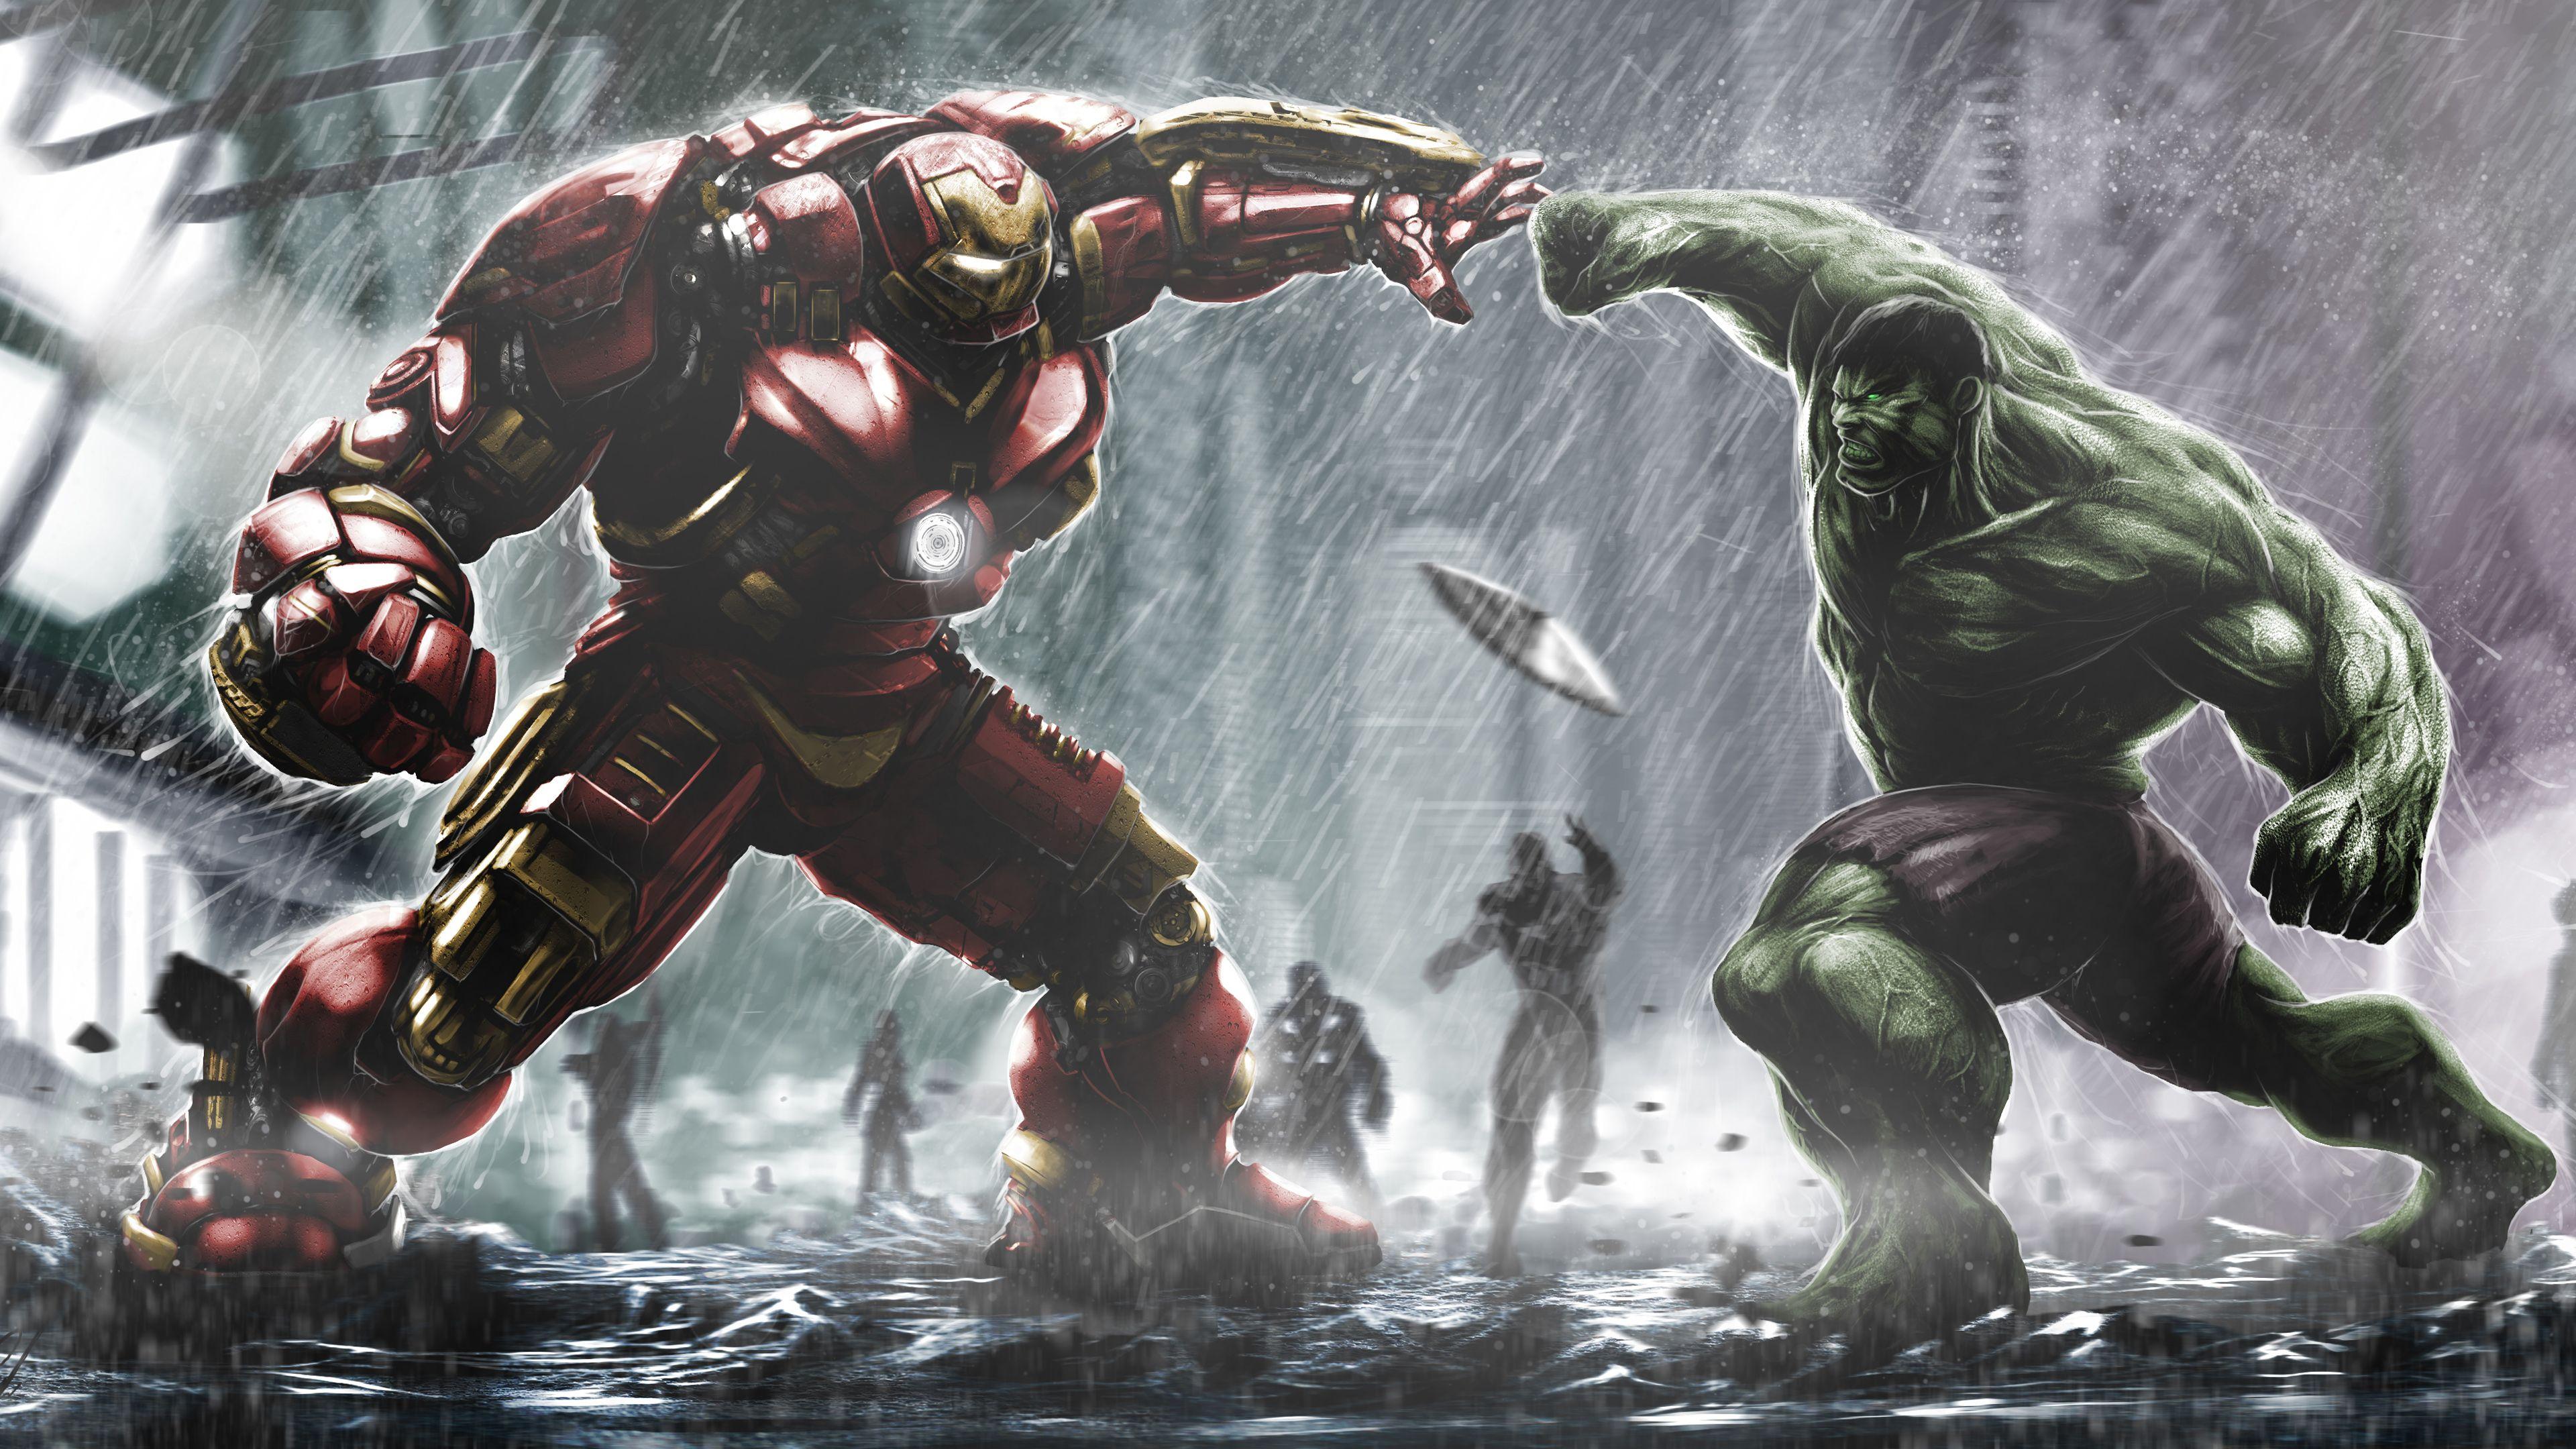 Hulkbuster Vs Hulk 4k Super Heroes Wallpapers Hulk